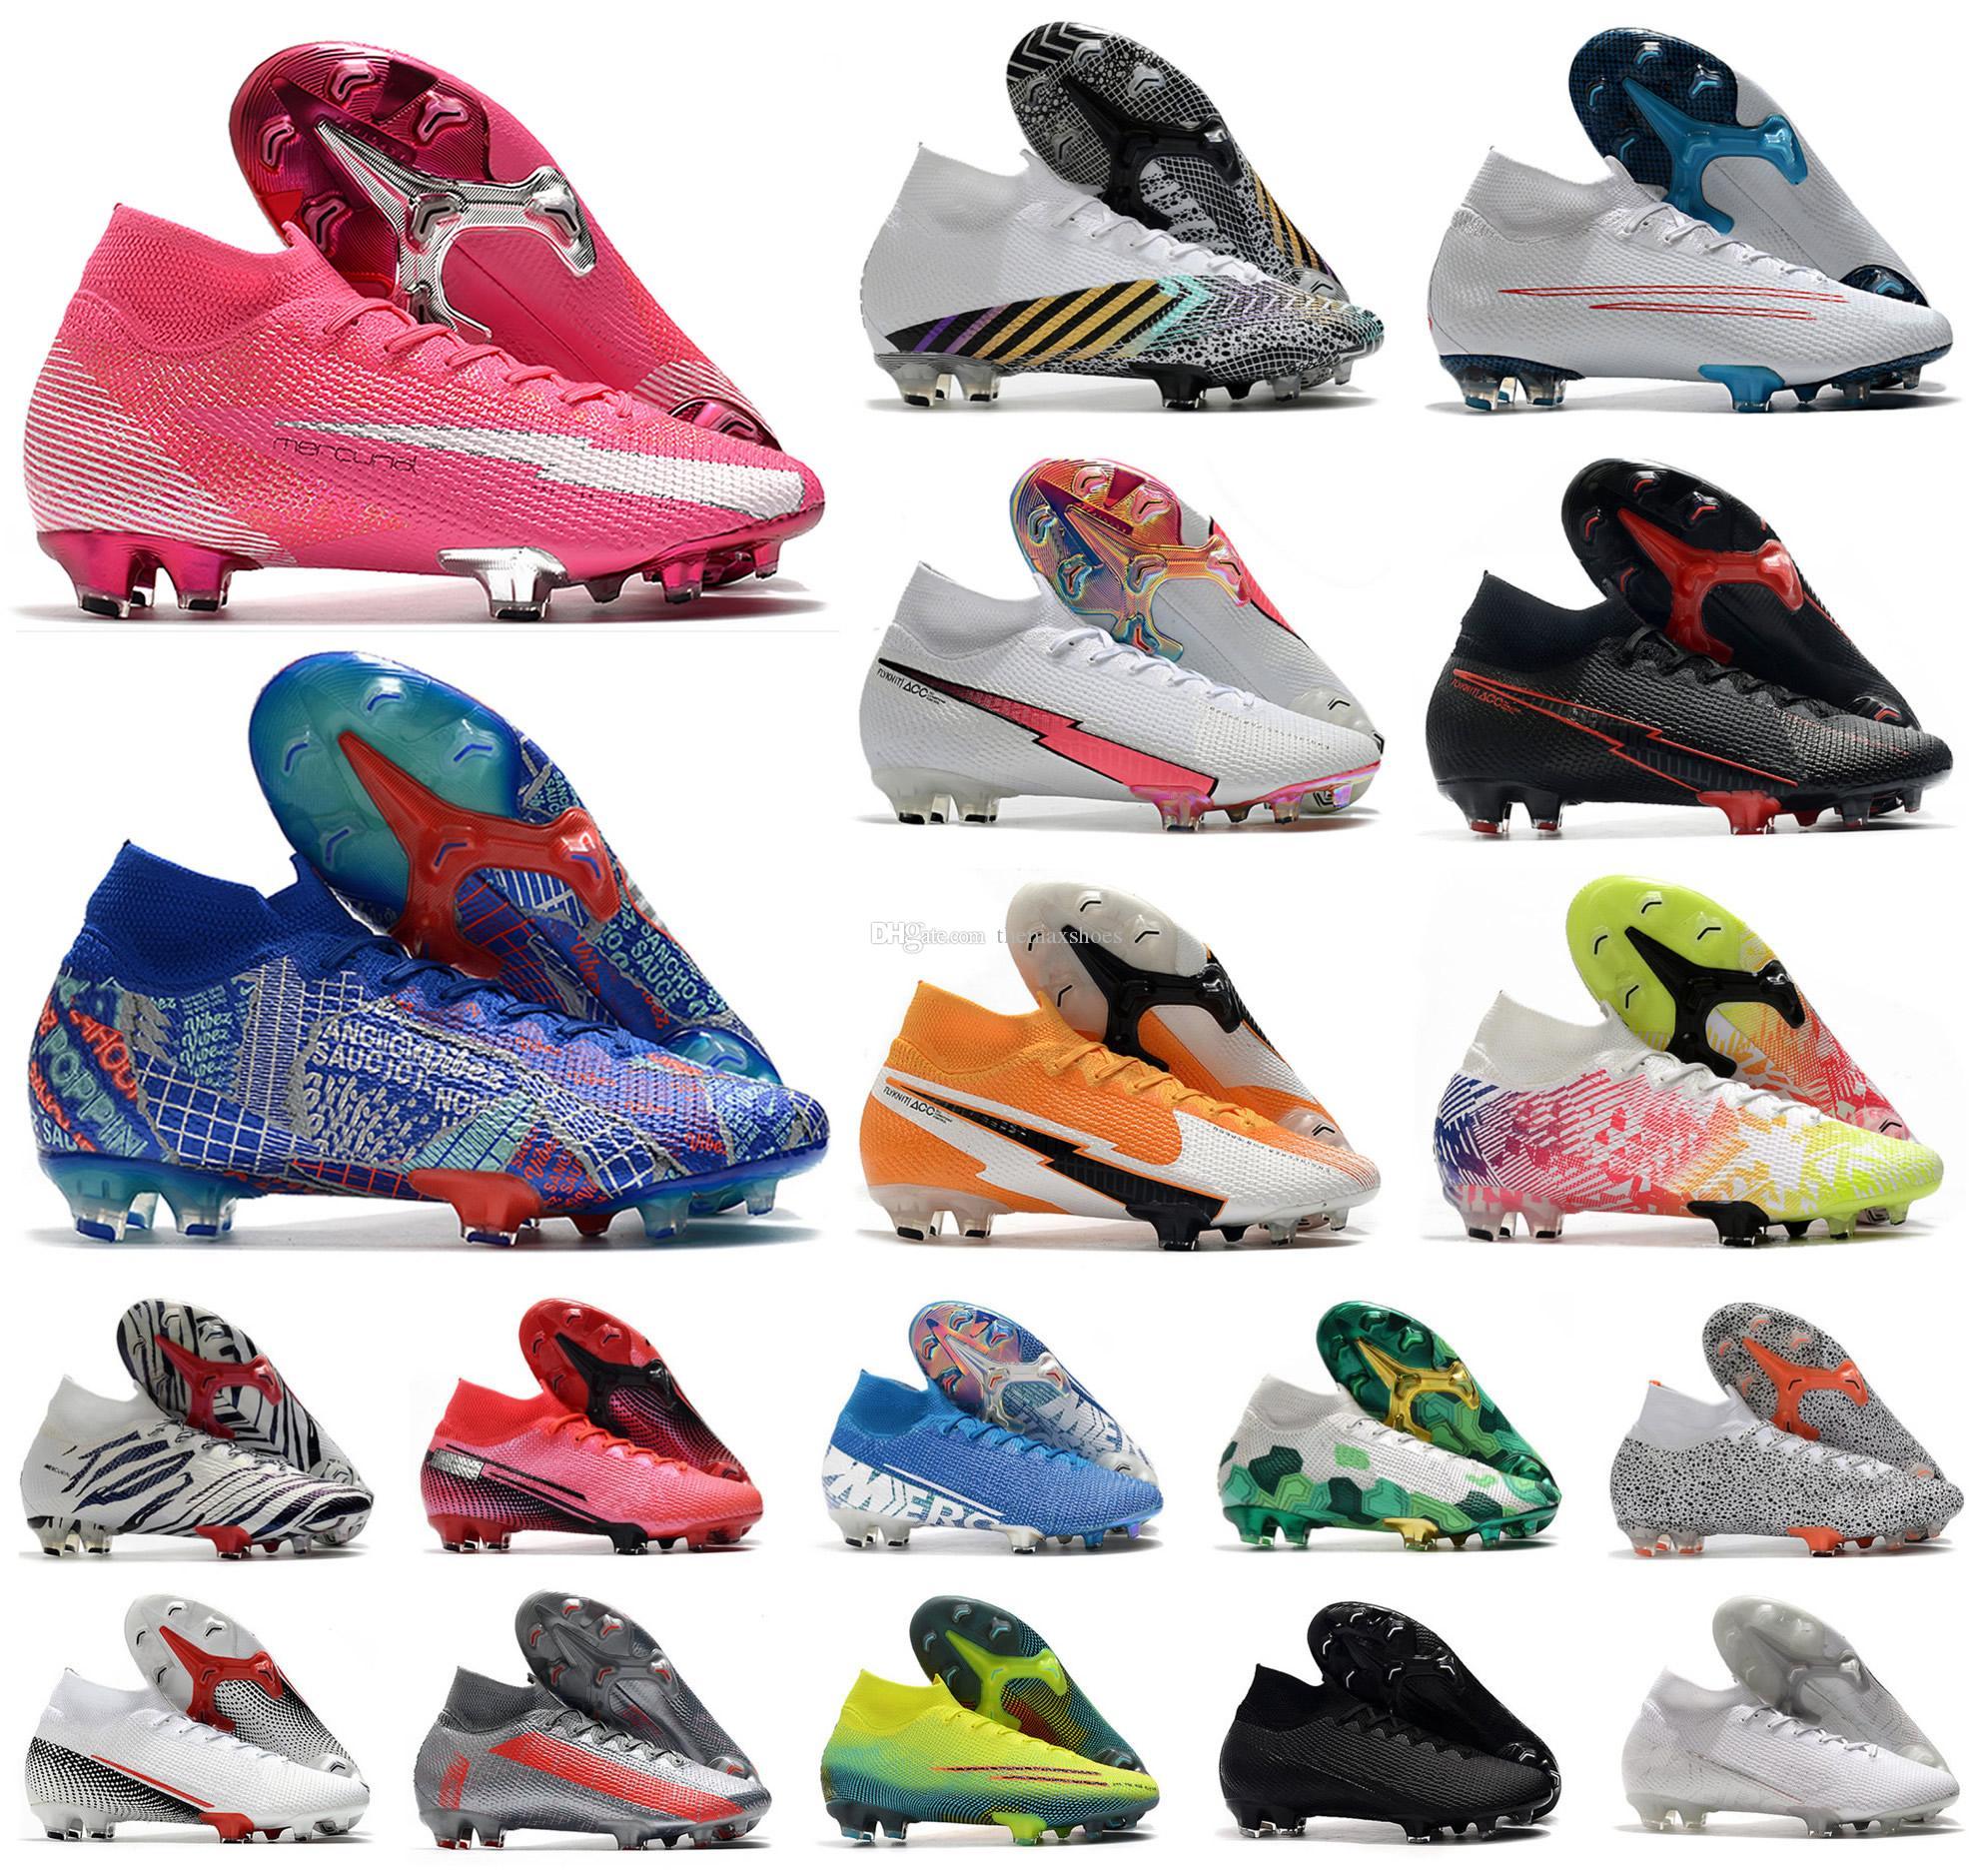 2020 Mercurial Superfly VII 7 360 Elite SE FG Rosa Panther Sancho Ronaldo Neymar Hommes CR7 Garçons Chaussures de football Chaussures de football Crampons US3-11